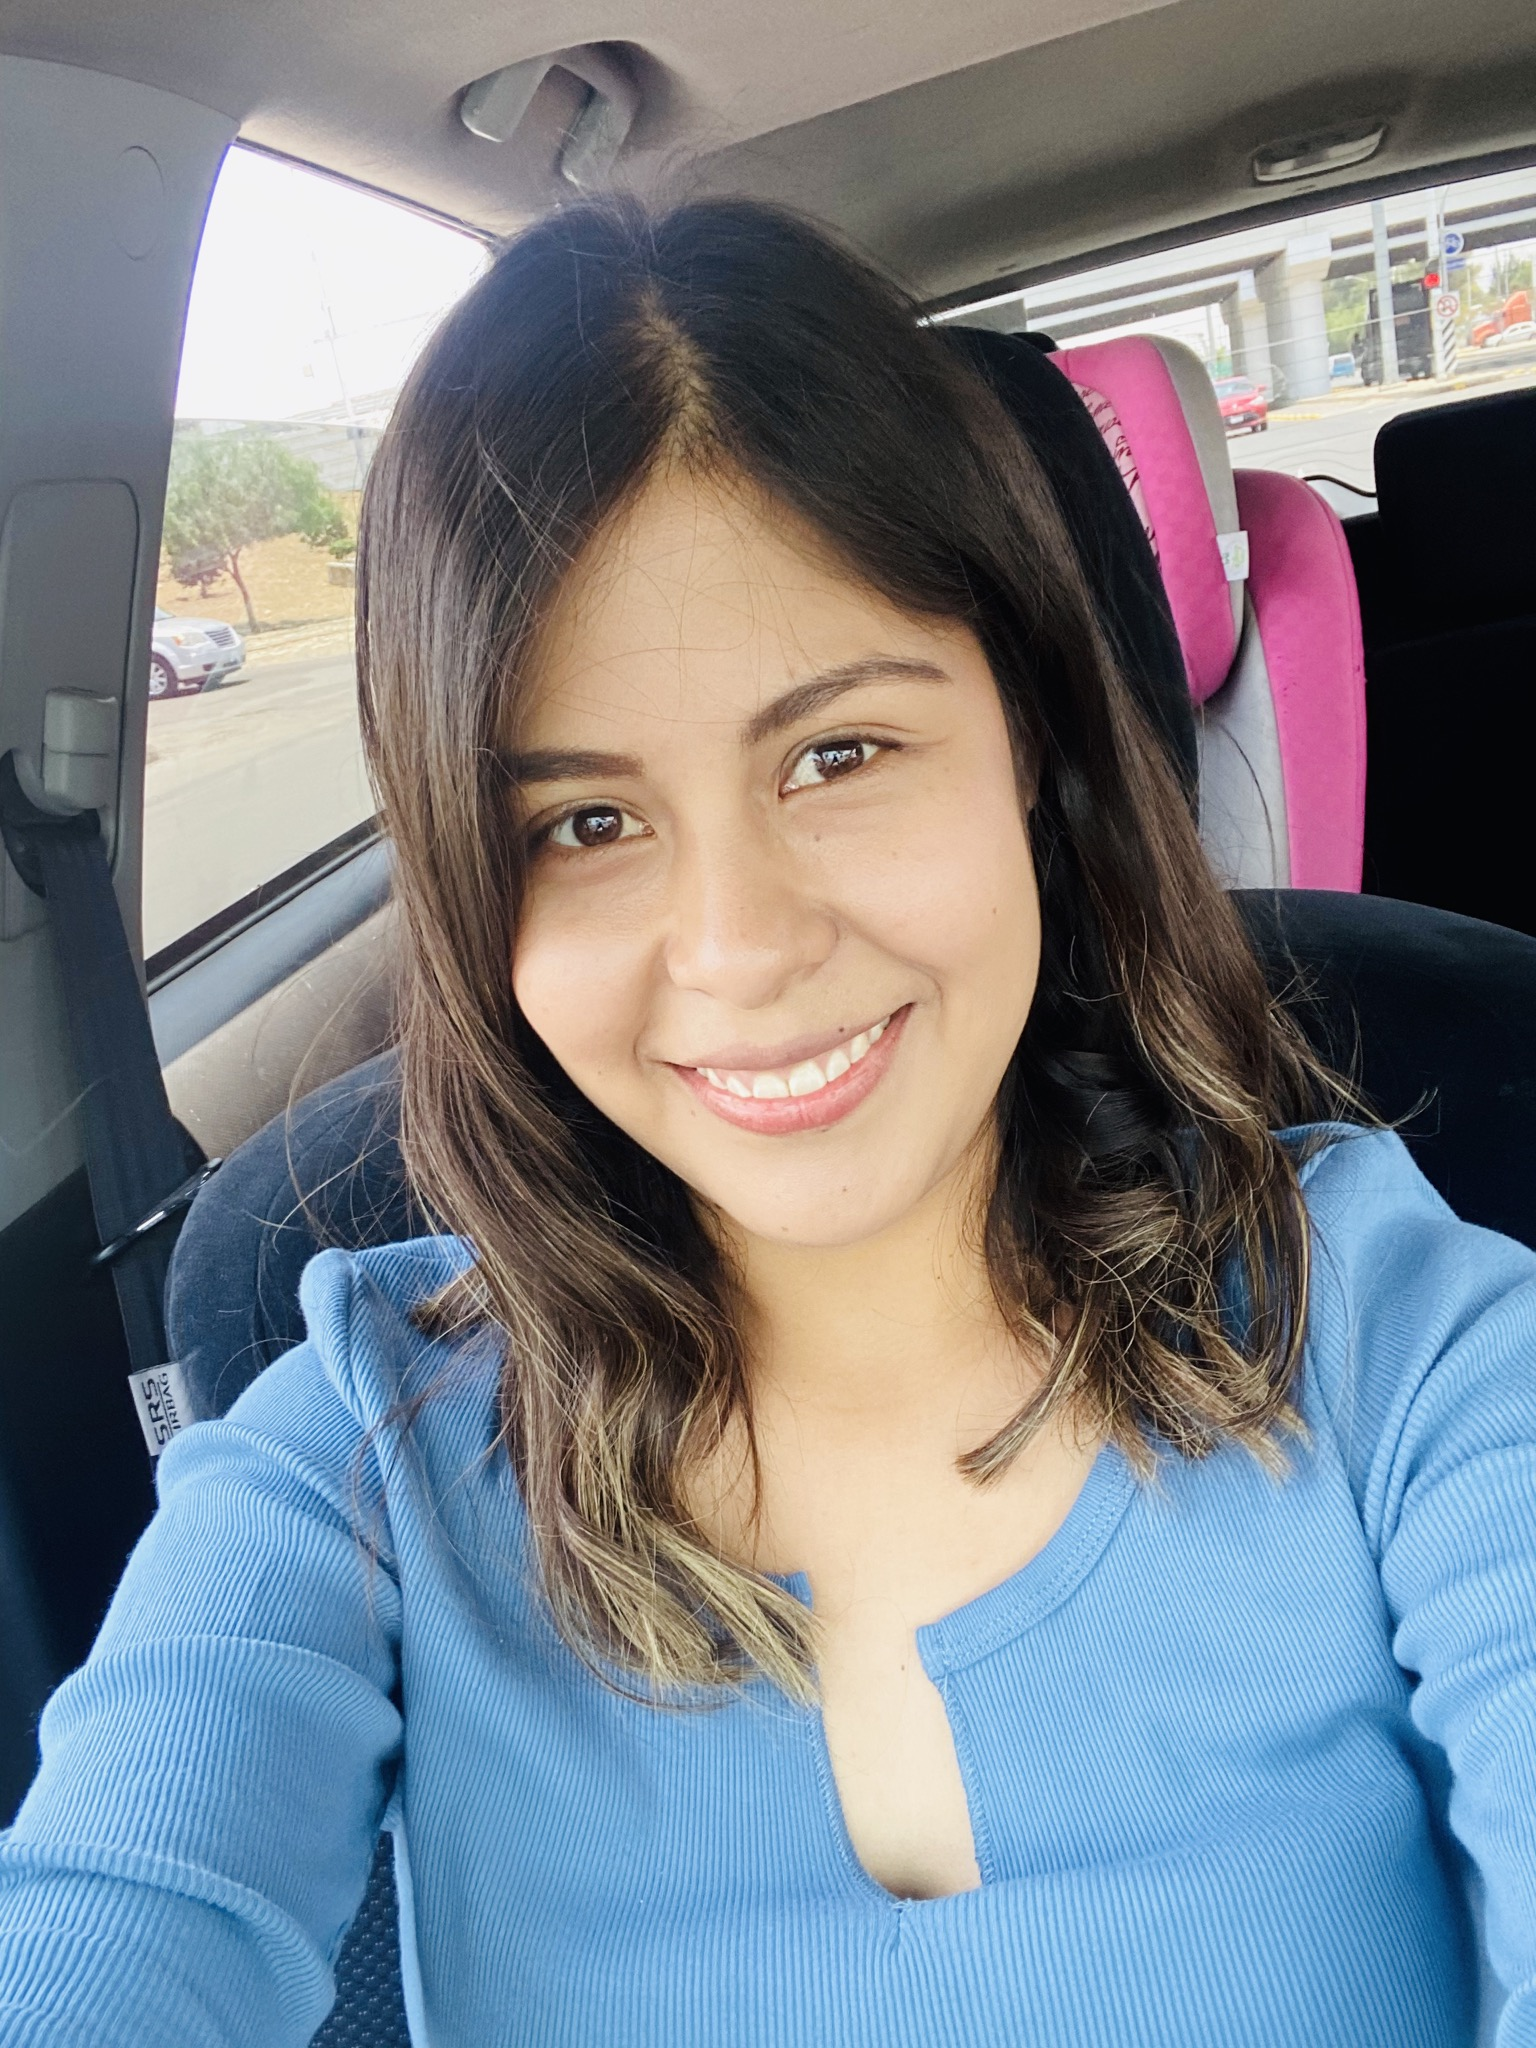 LUZ MARIA CHAVEZ MIRANDA